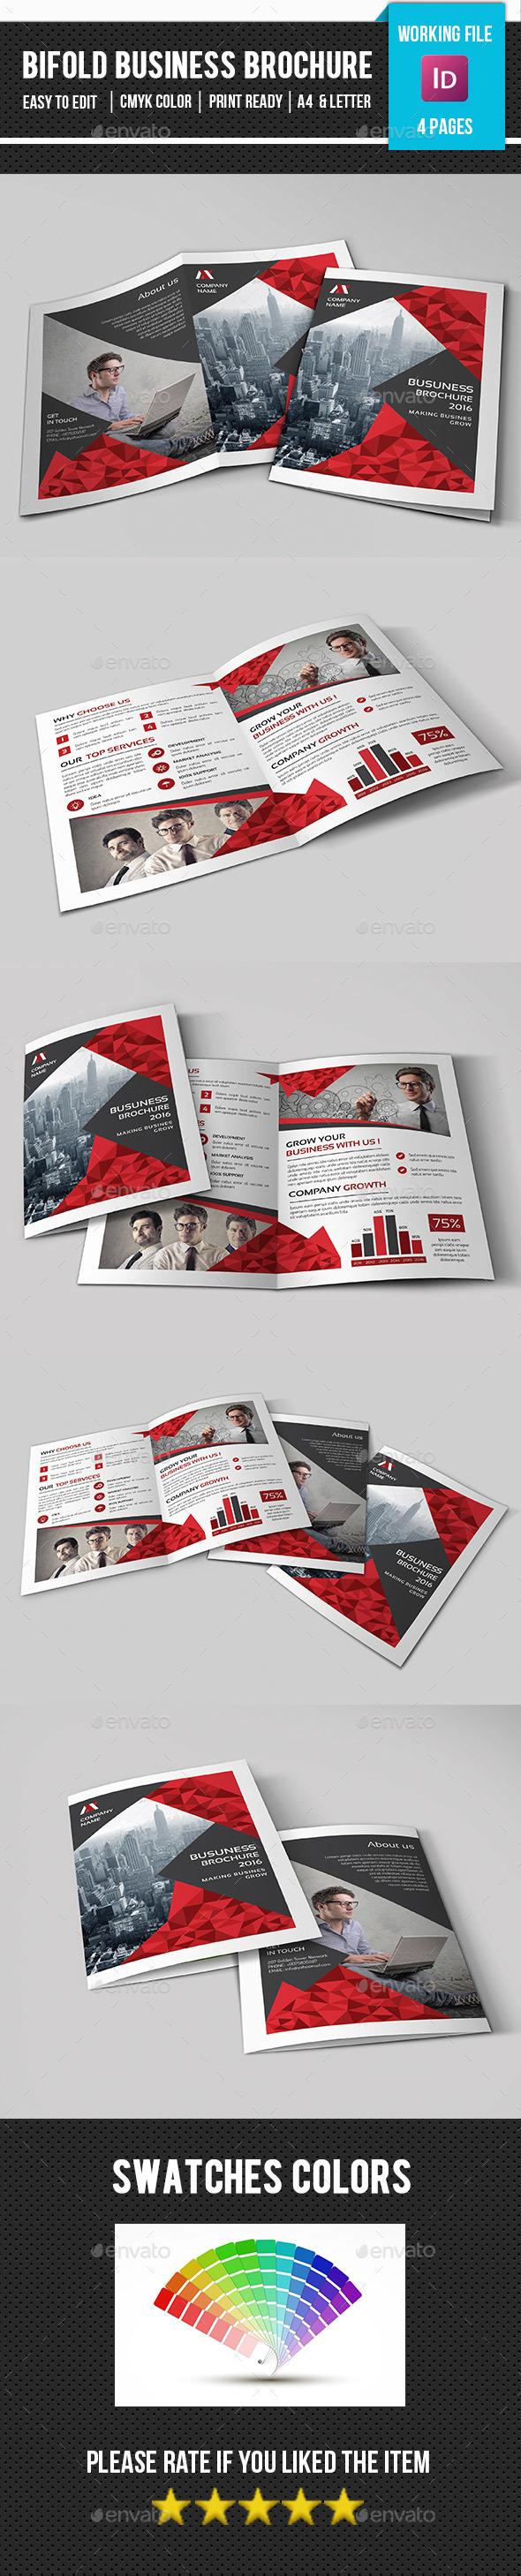 Creative Corporate Bifold Brochure-V361 - Corporate Brochures